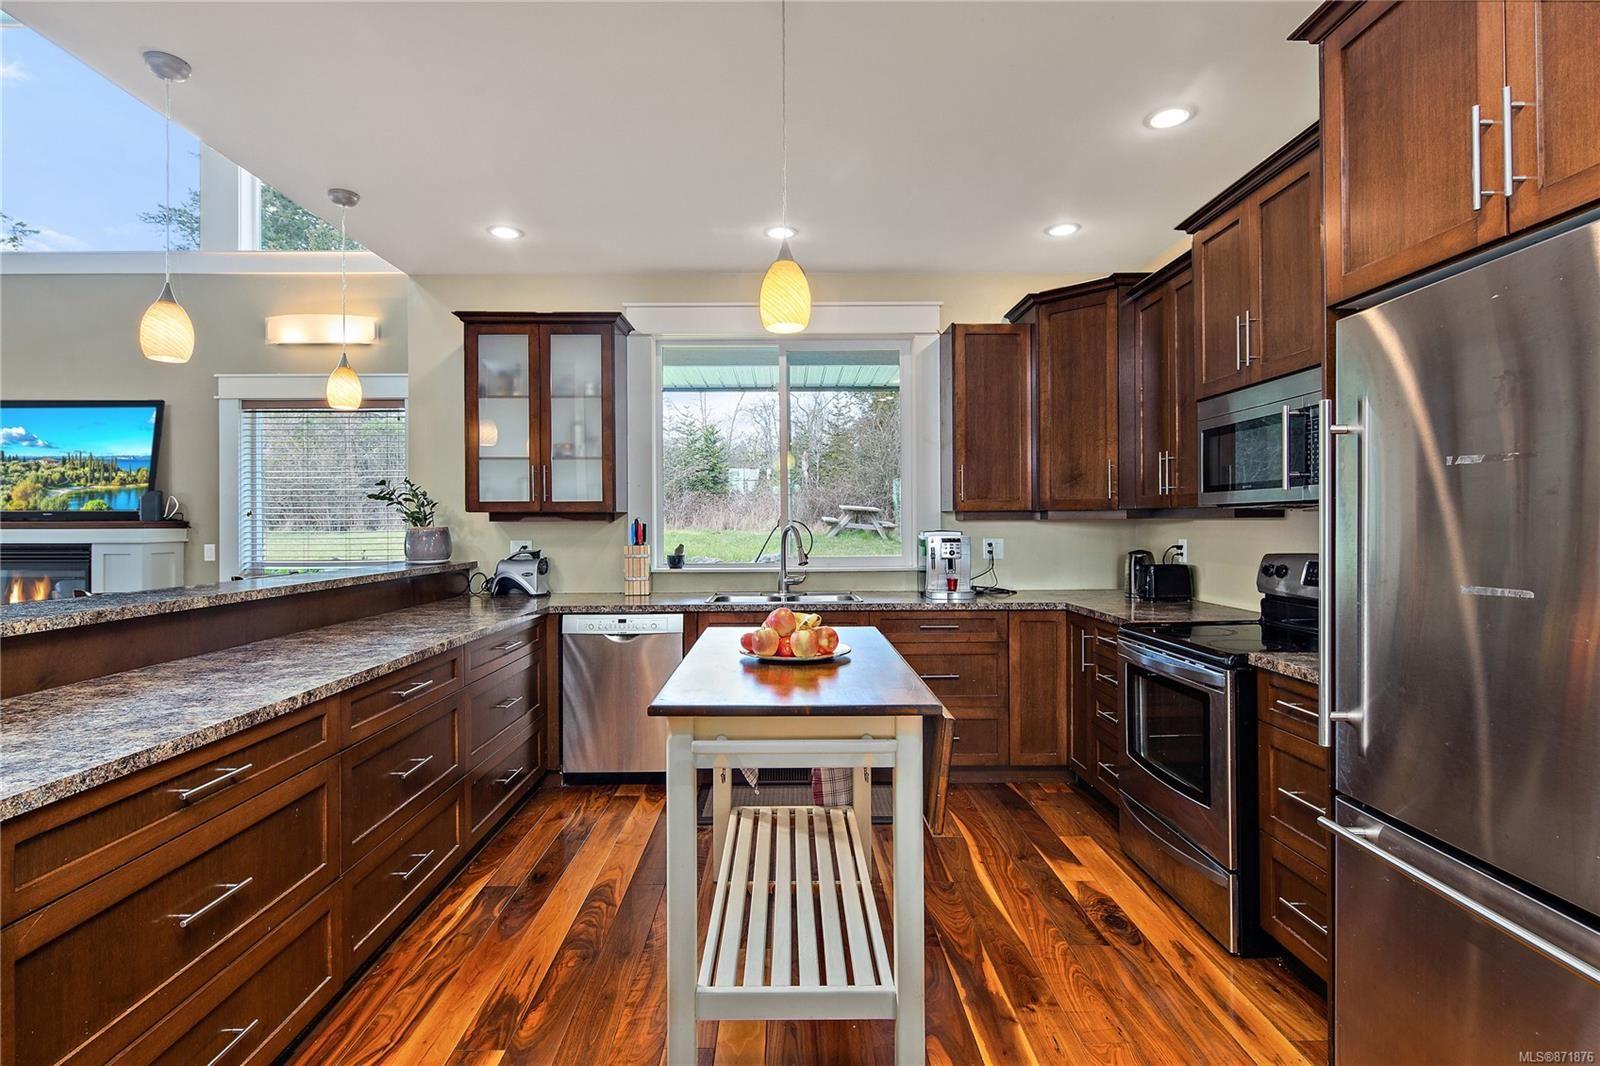 Photo 12: Photos: 4420 Wilkinson Rd in : SW Royal Oak House for sale (Saanich West)  : MLS®# 871876